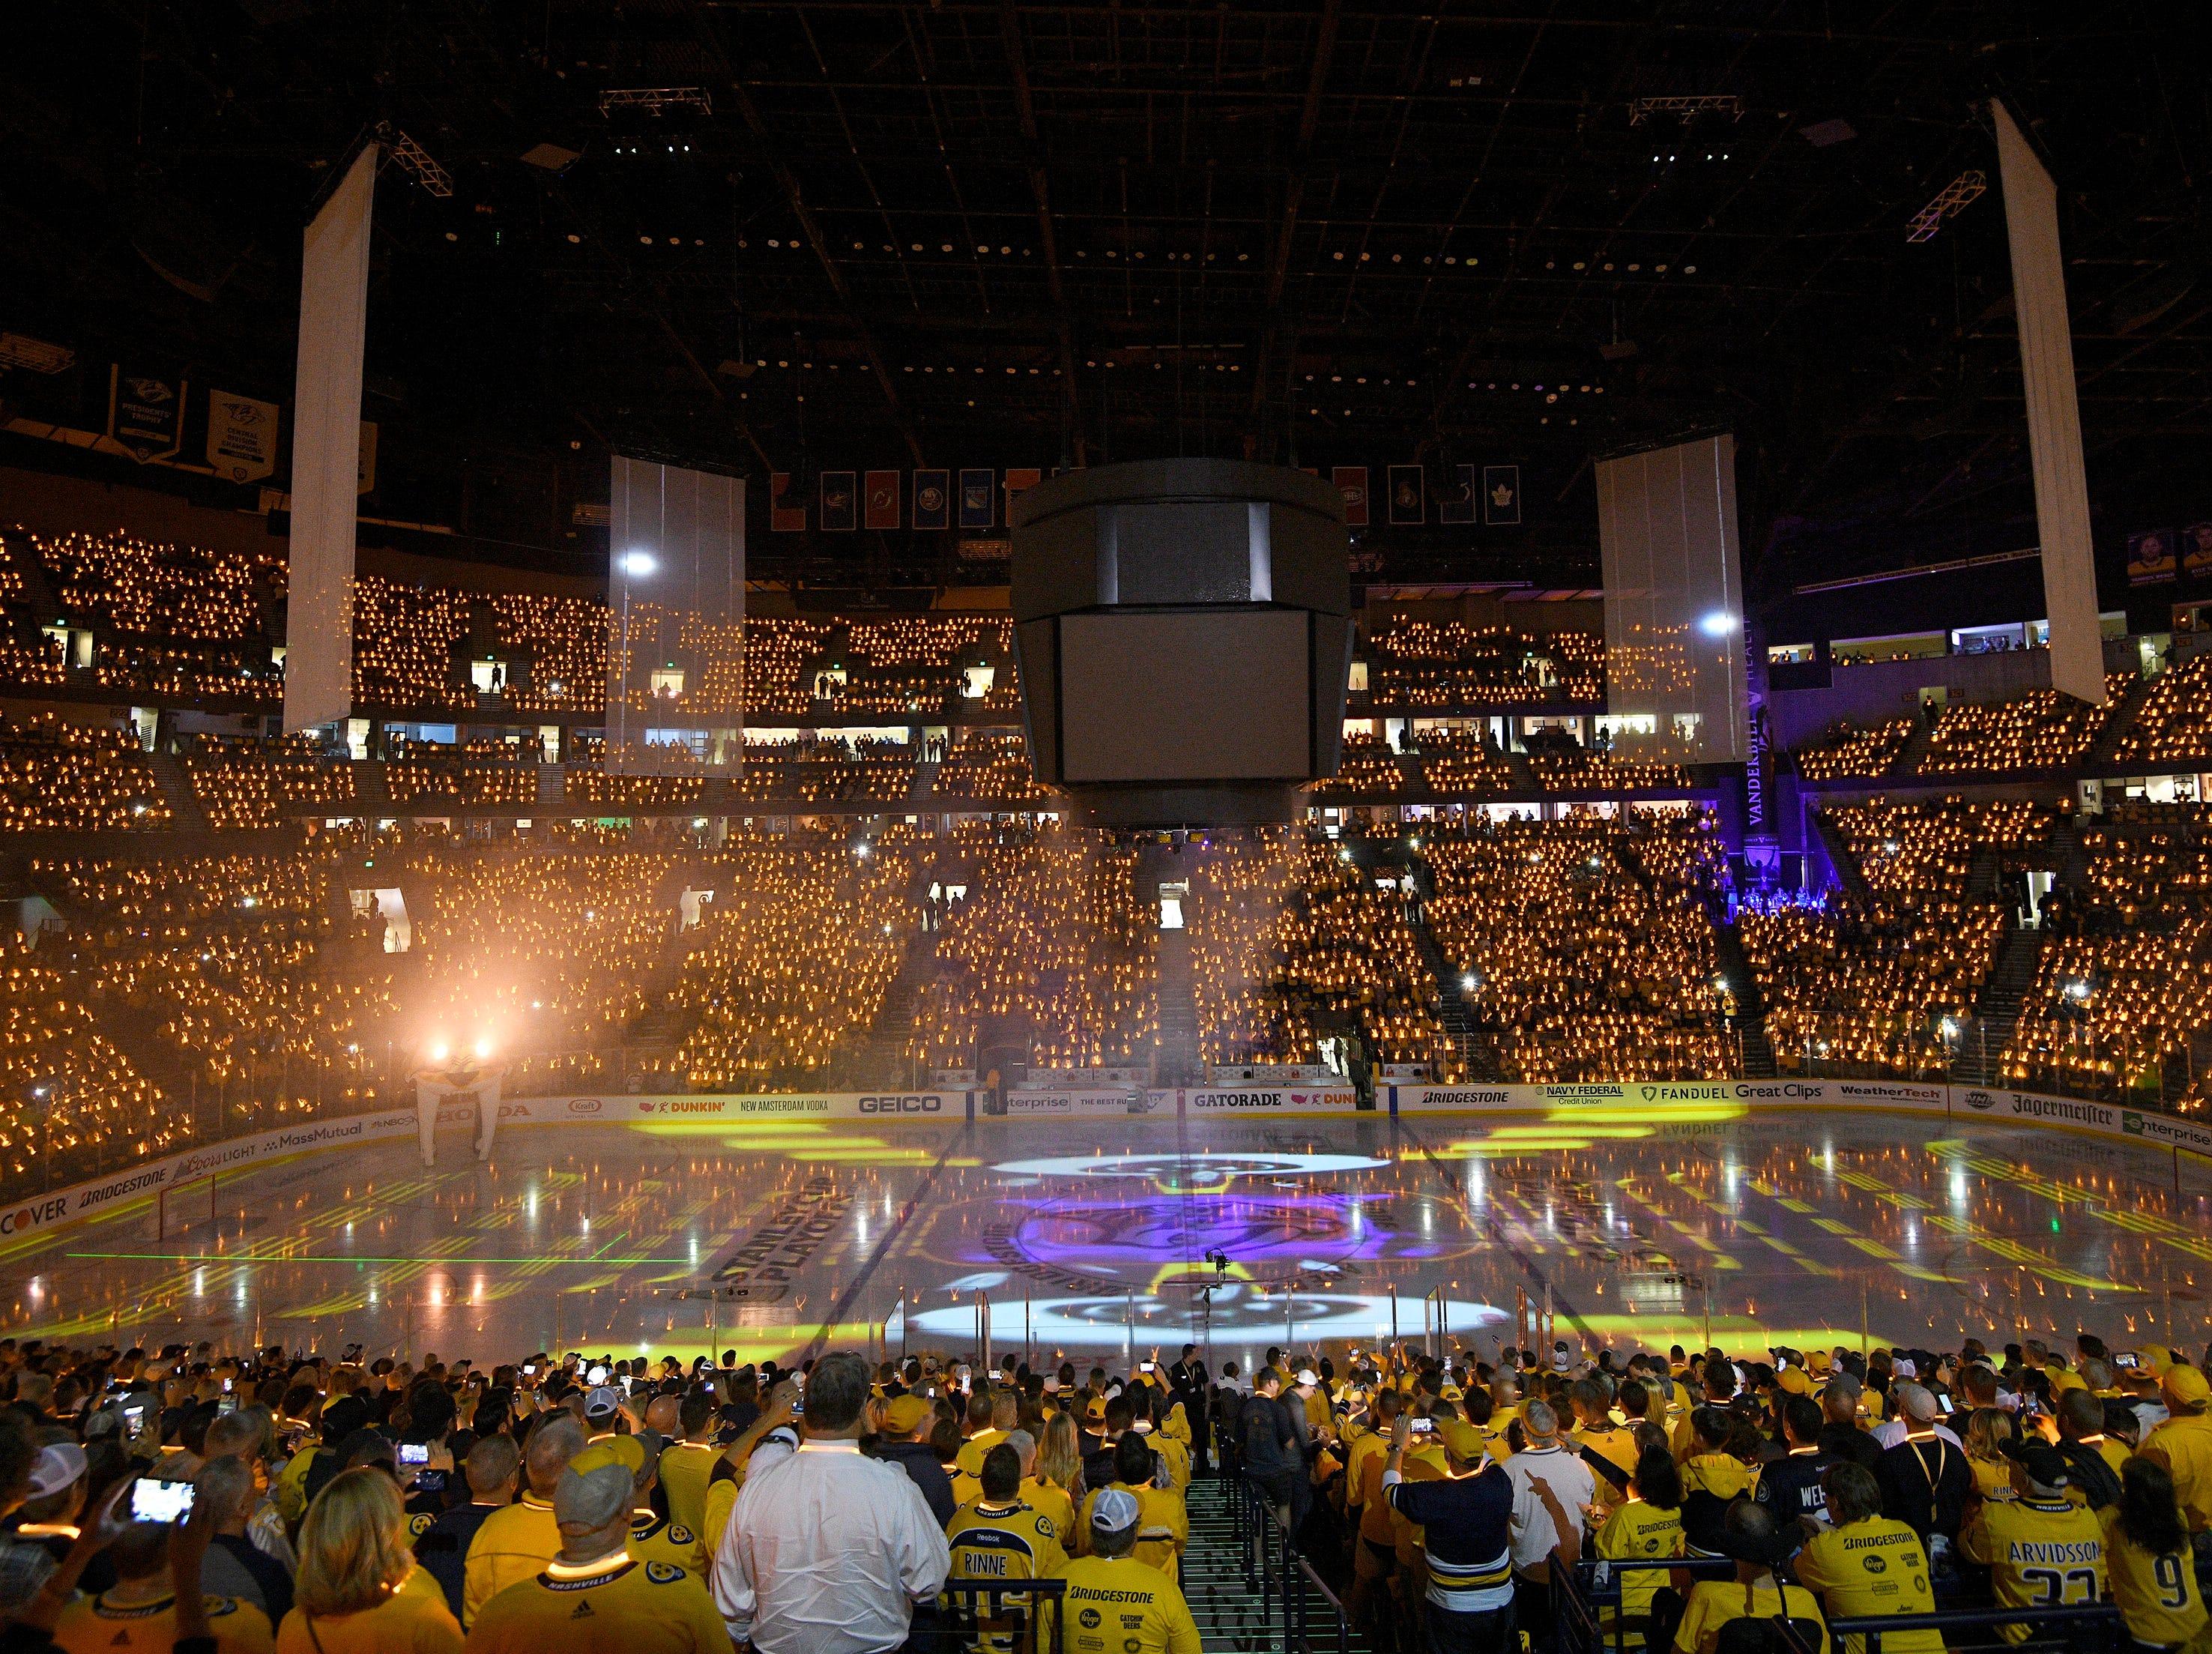 Pregame festivities before the Predators' divisional semifinal game at Bridgestone Arena in Nashville, Tenn., Wednesday, April 10, 2019.